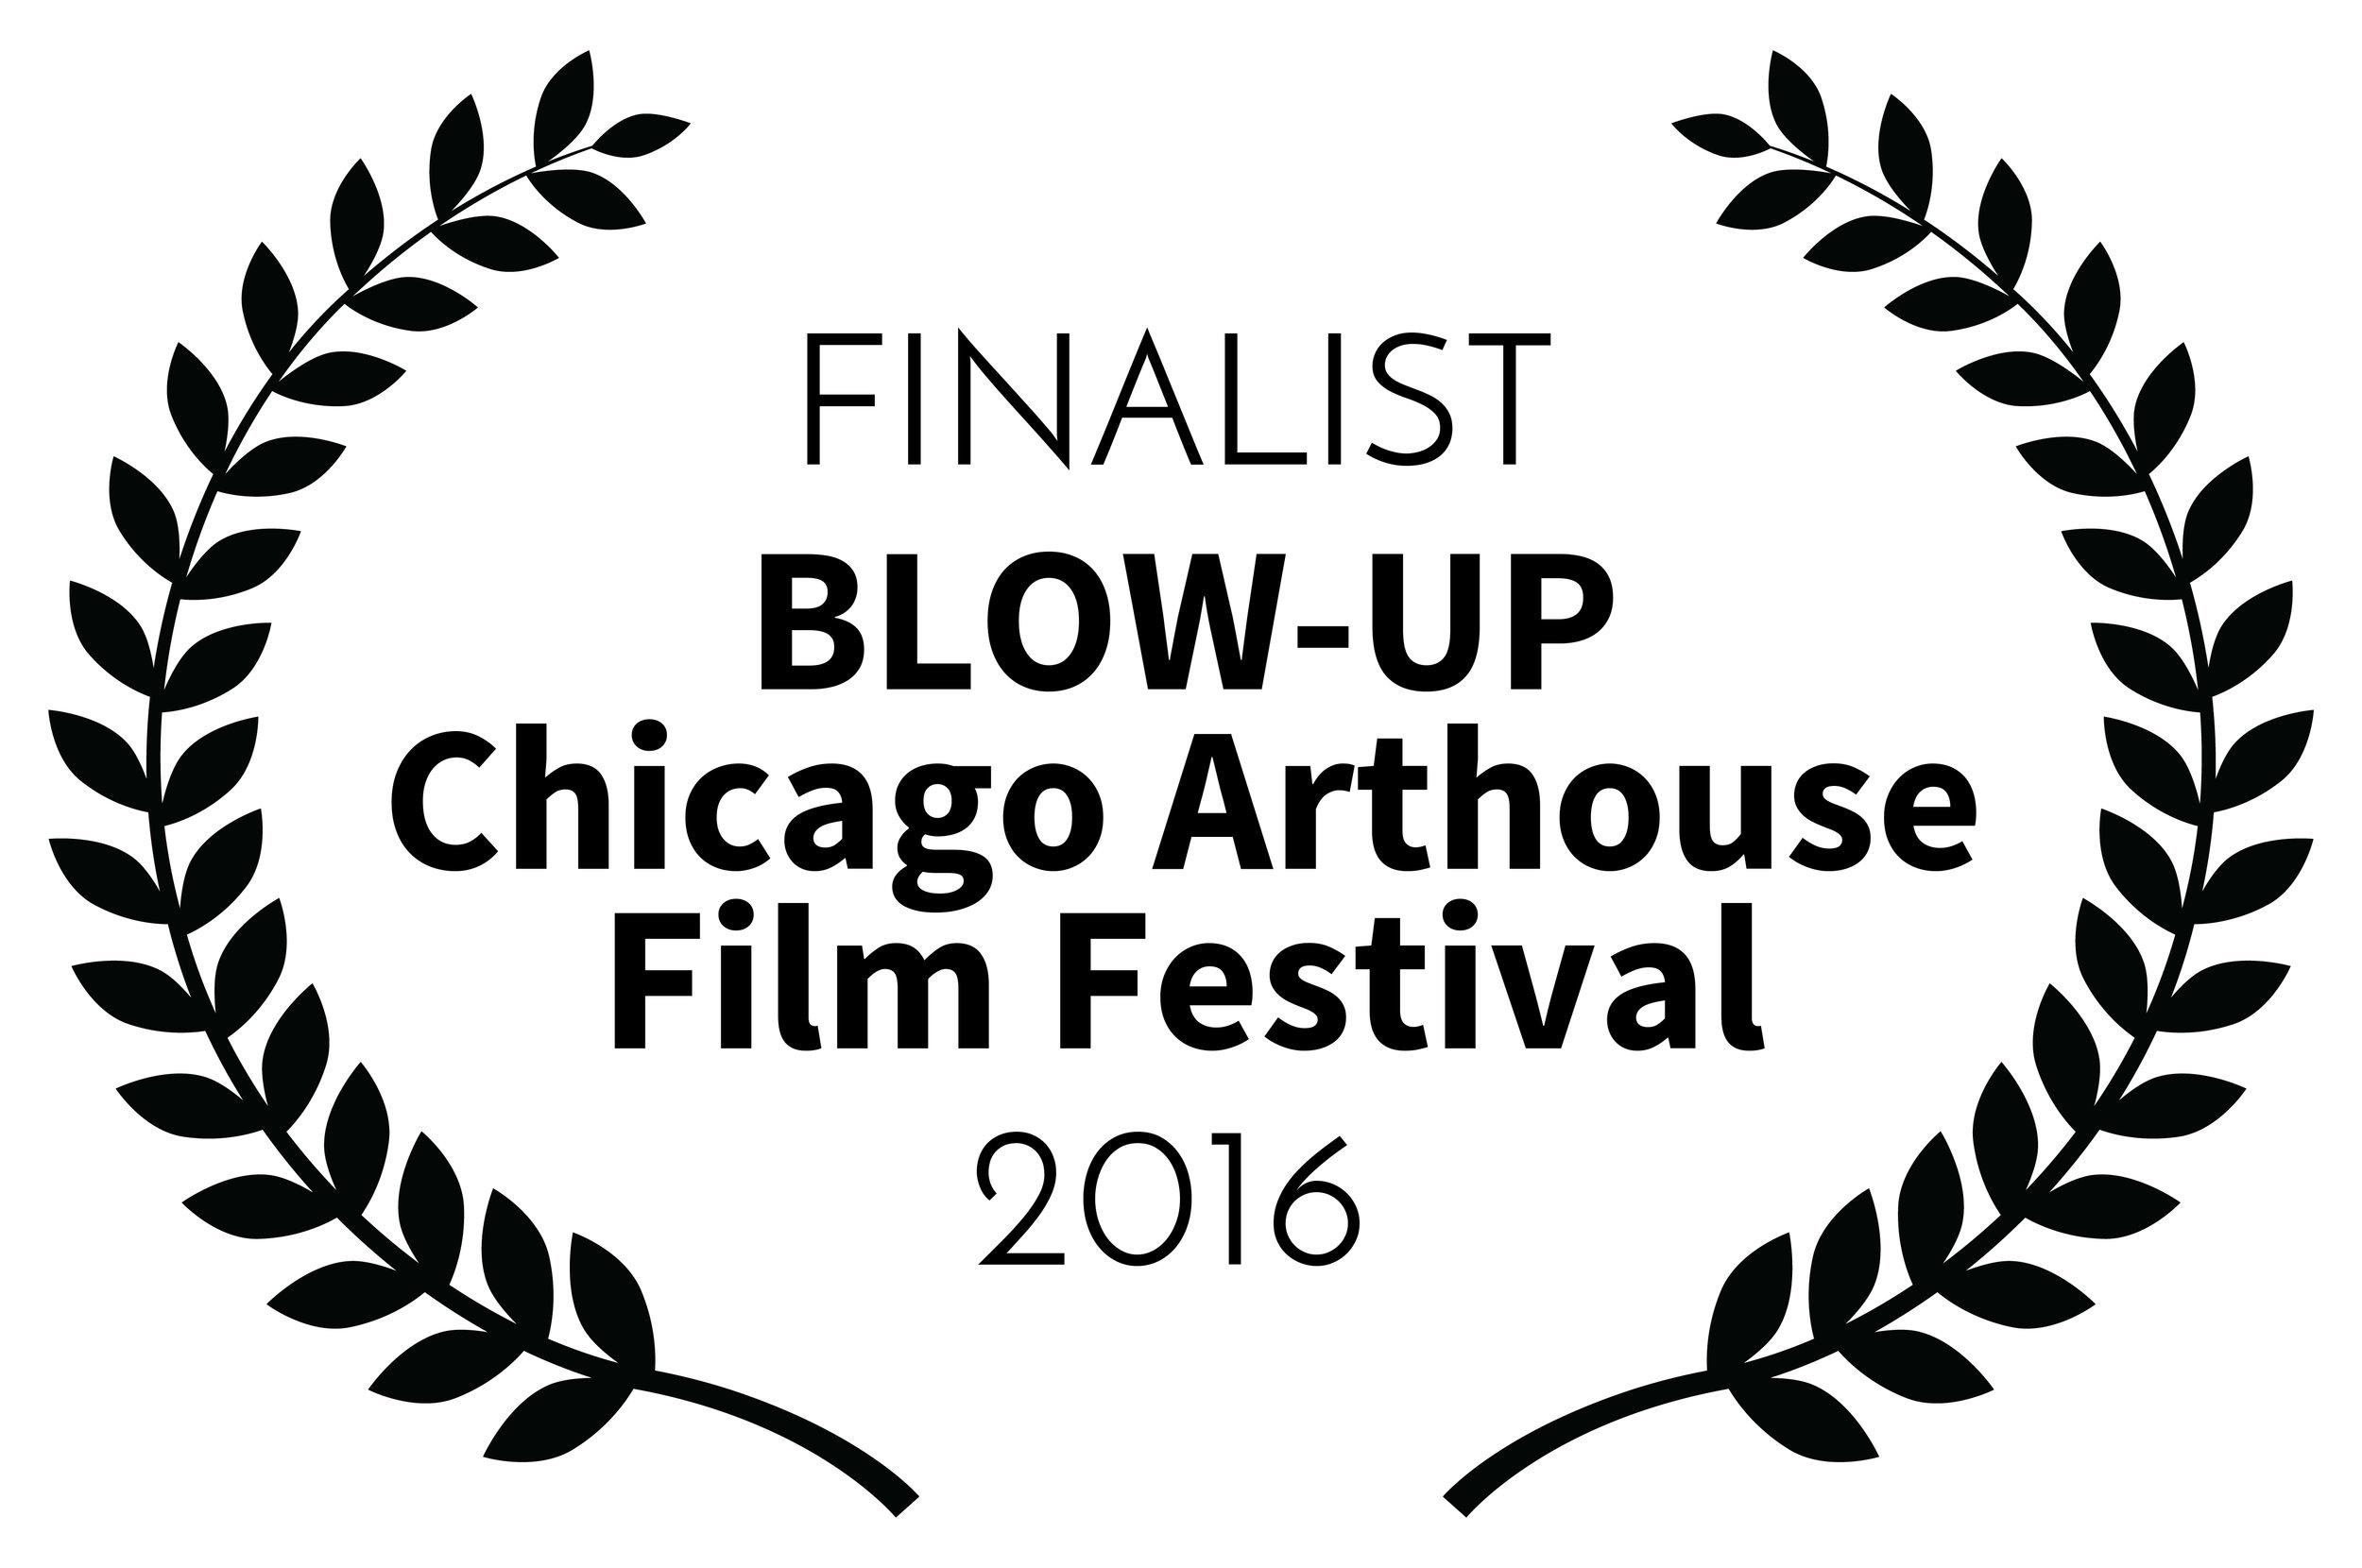 FINALIST-BLOW-UPChicagoArthouseFilmFestival-2016 kopi.jpg